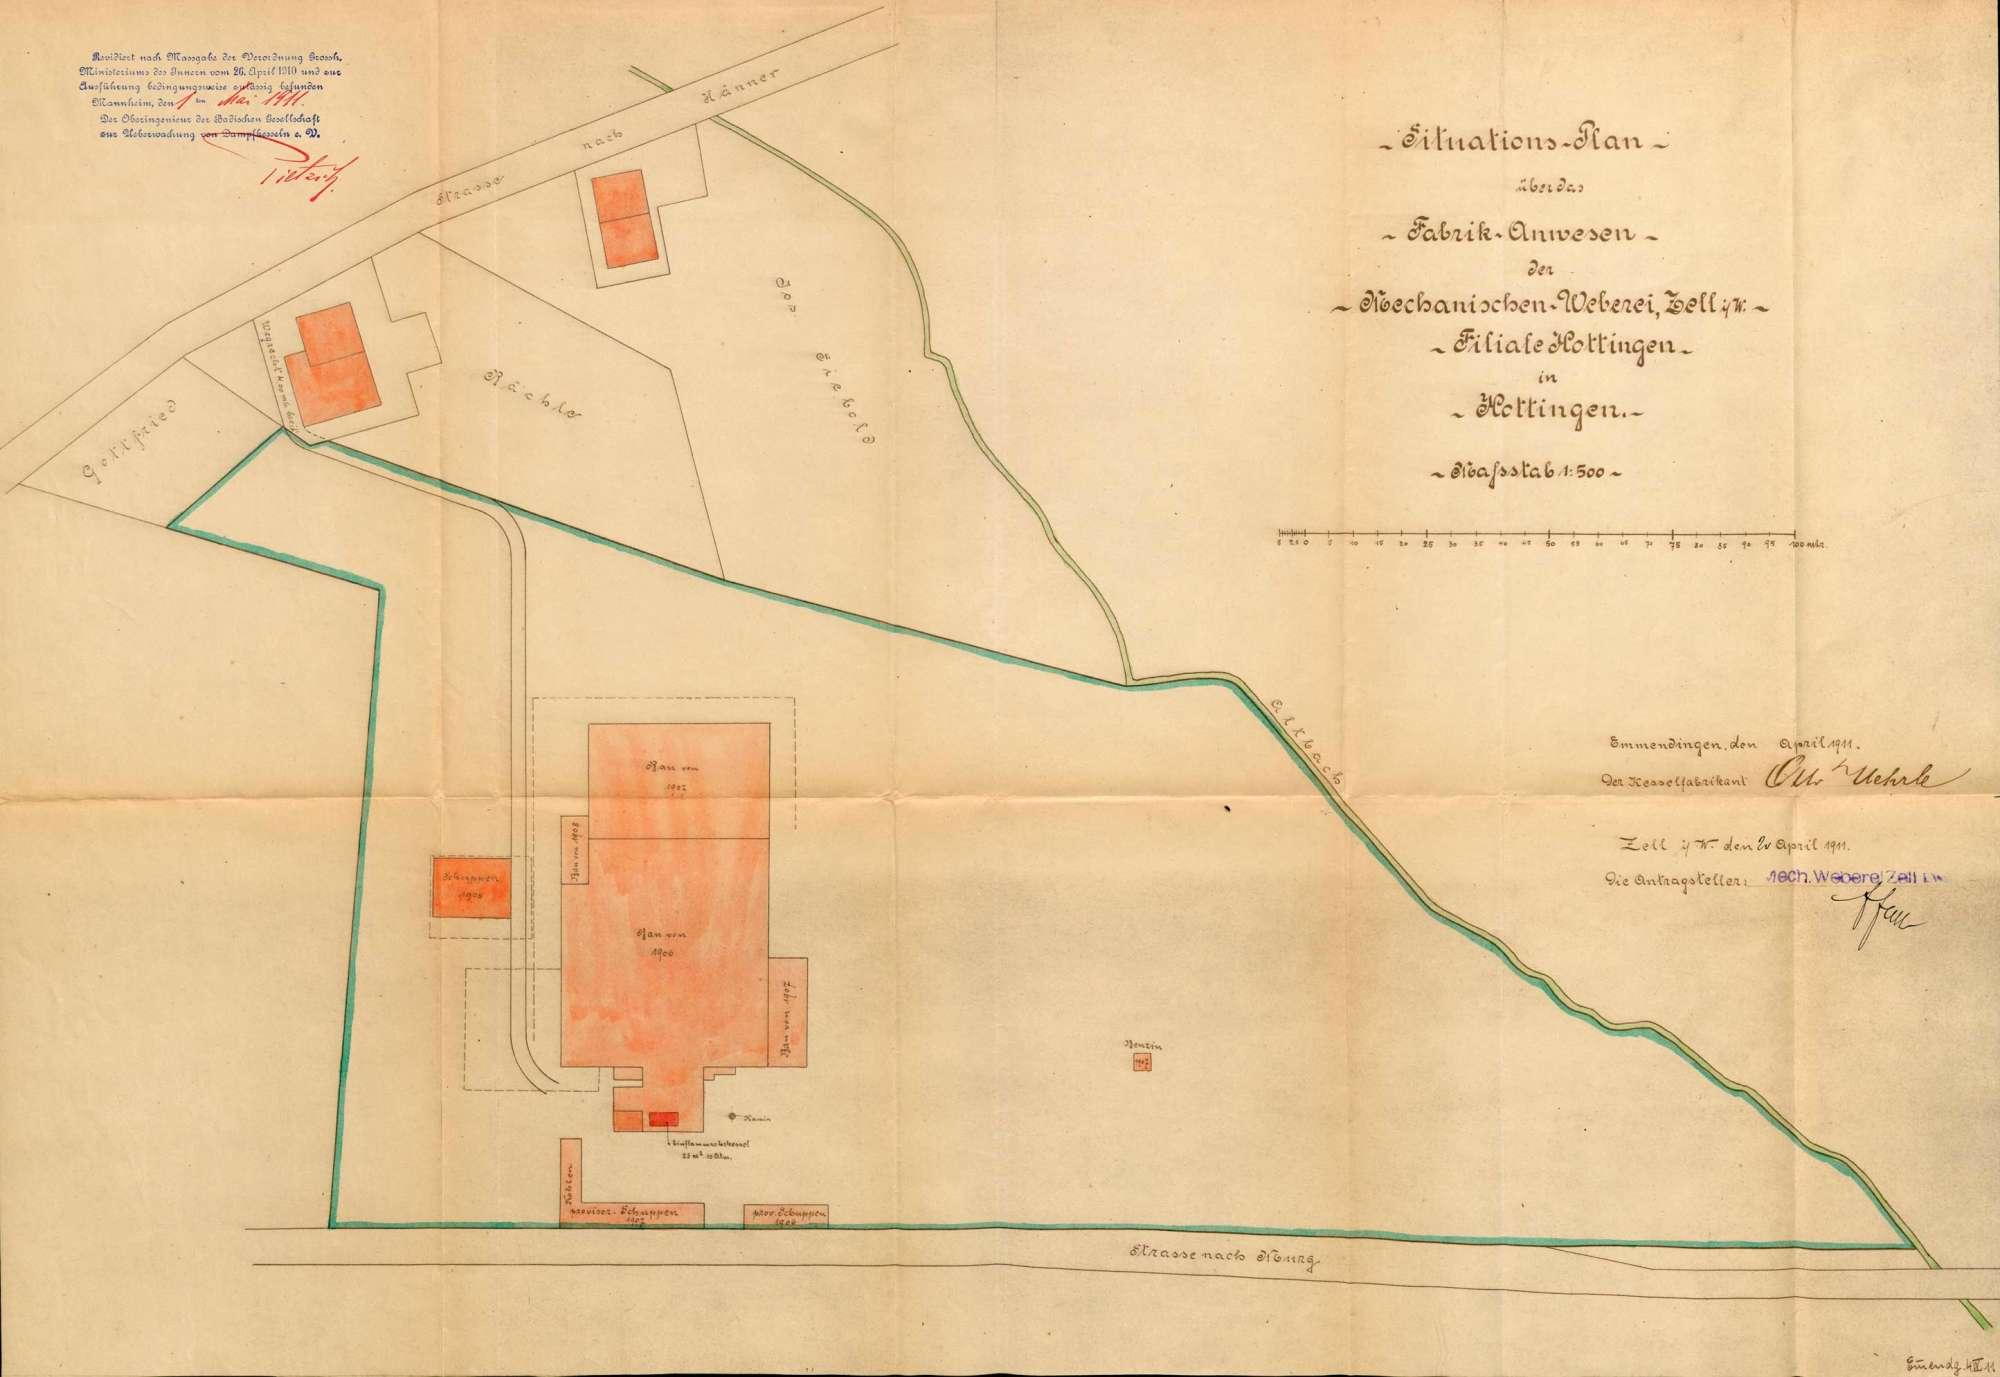 Dampfkessel der Firma Mechanische Weberei Zell im Wiesental in Hottingen, Bild 1